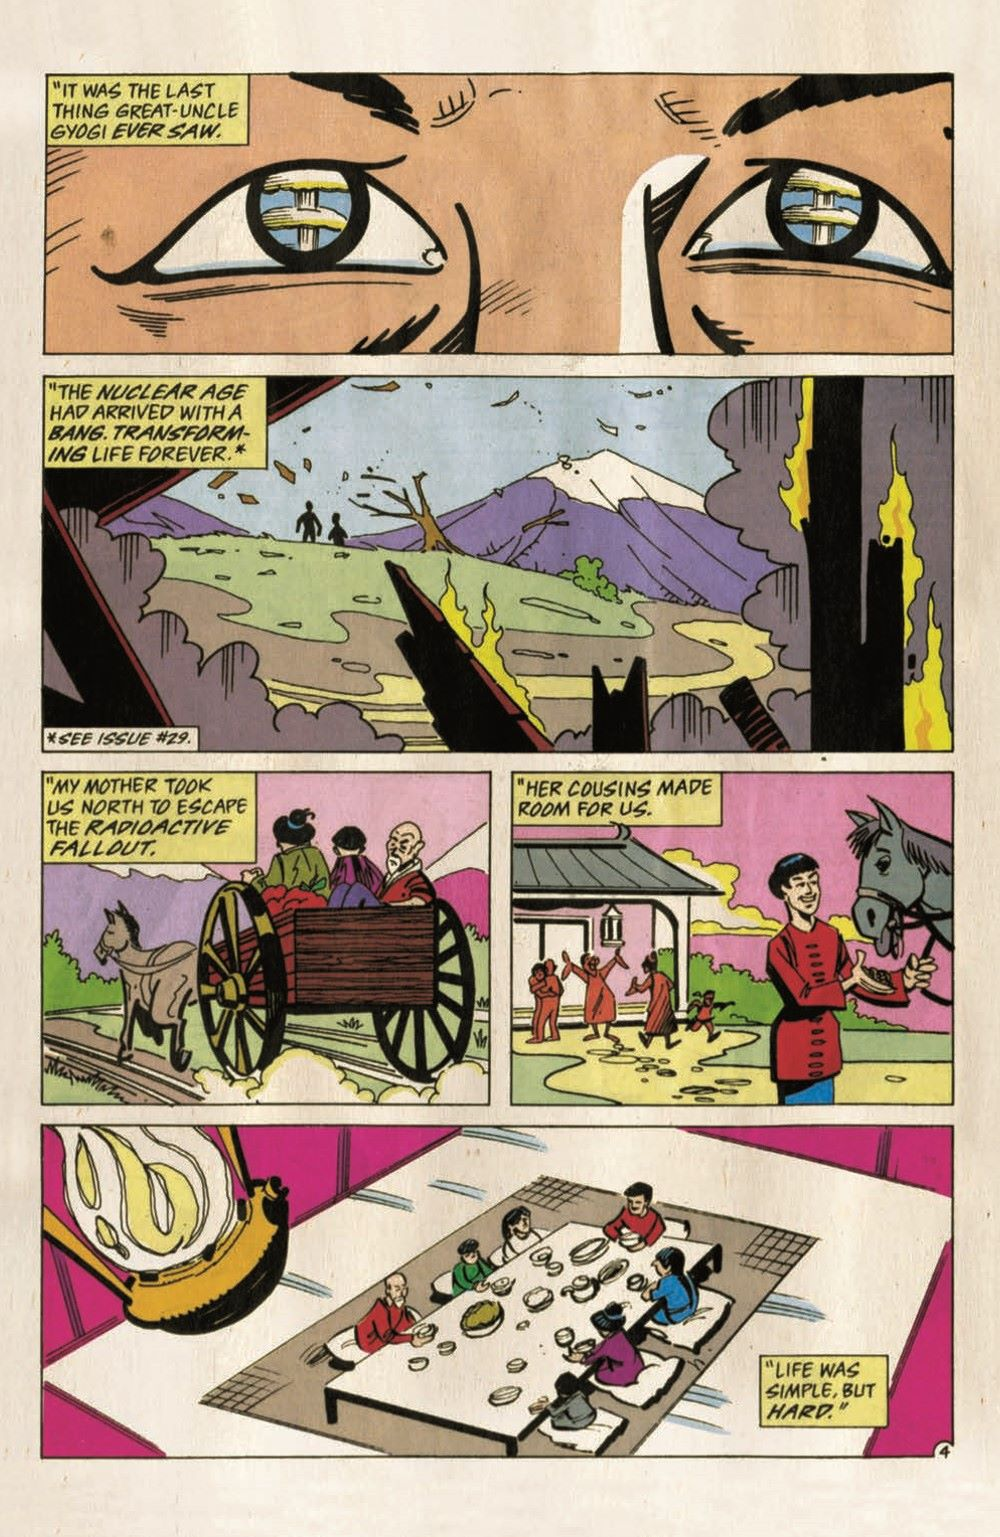 TMNT-Bestof-Splinter_pr-6 ComicList Previews: TEENAGE MUTANT NINJA TURTLES BEST OF SPLINTER #1